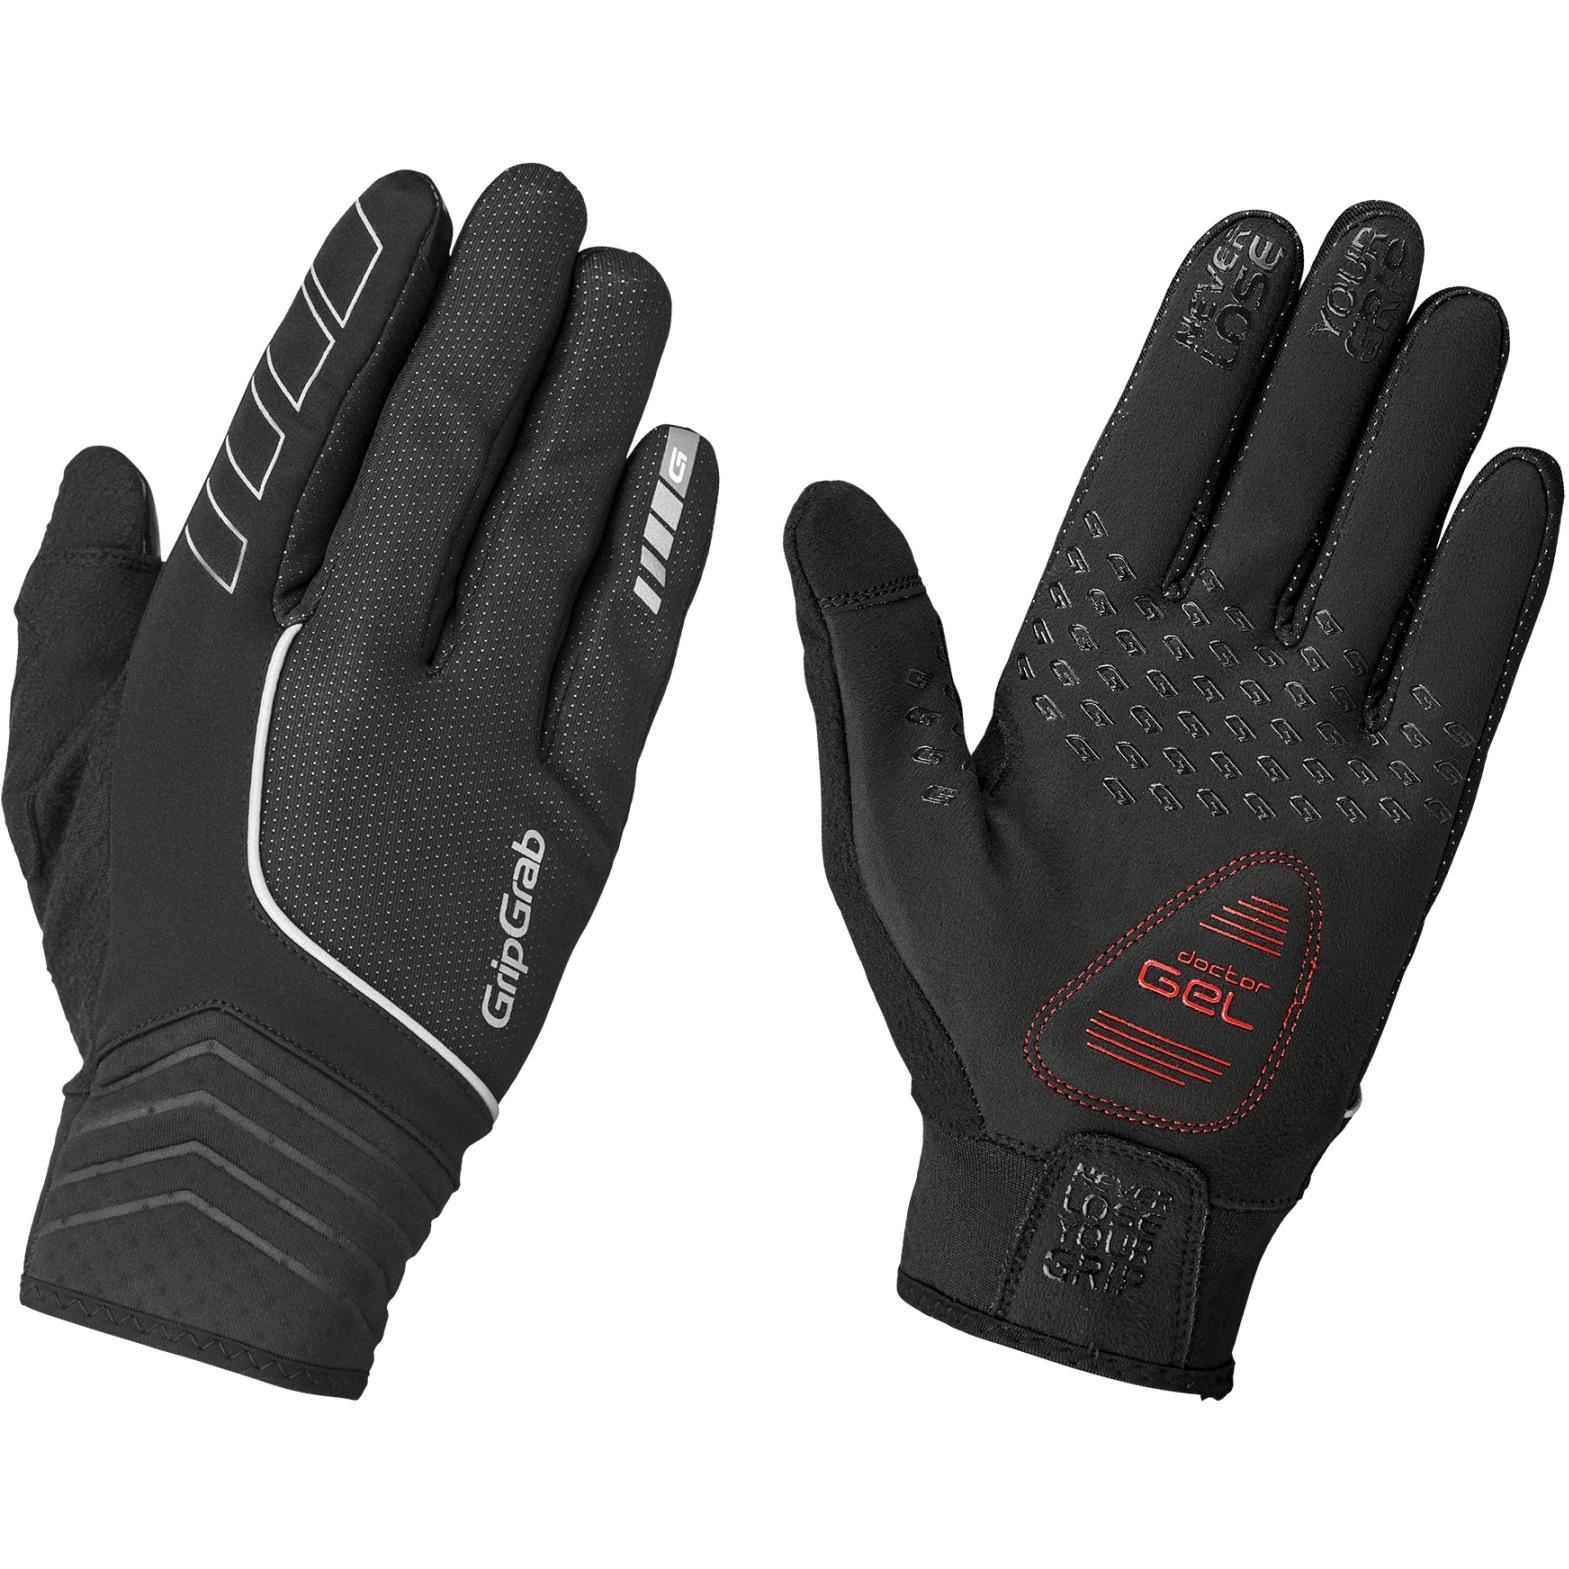 GripGrab Hurricane Windproof Midseason Glove - Black